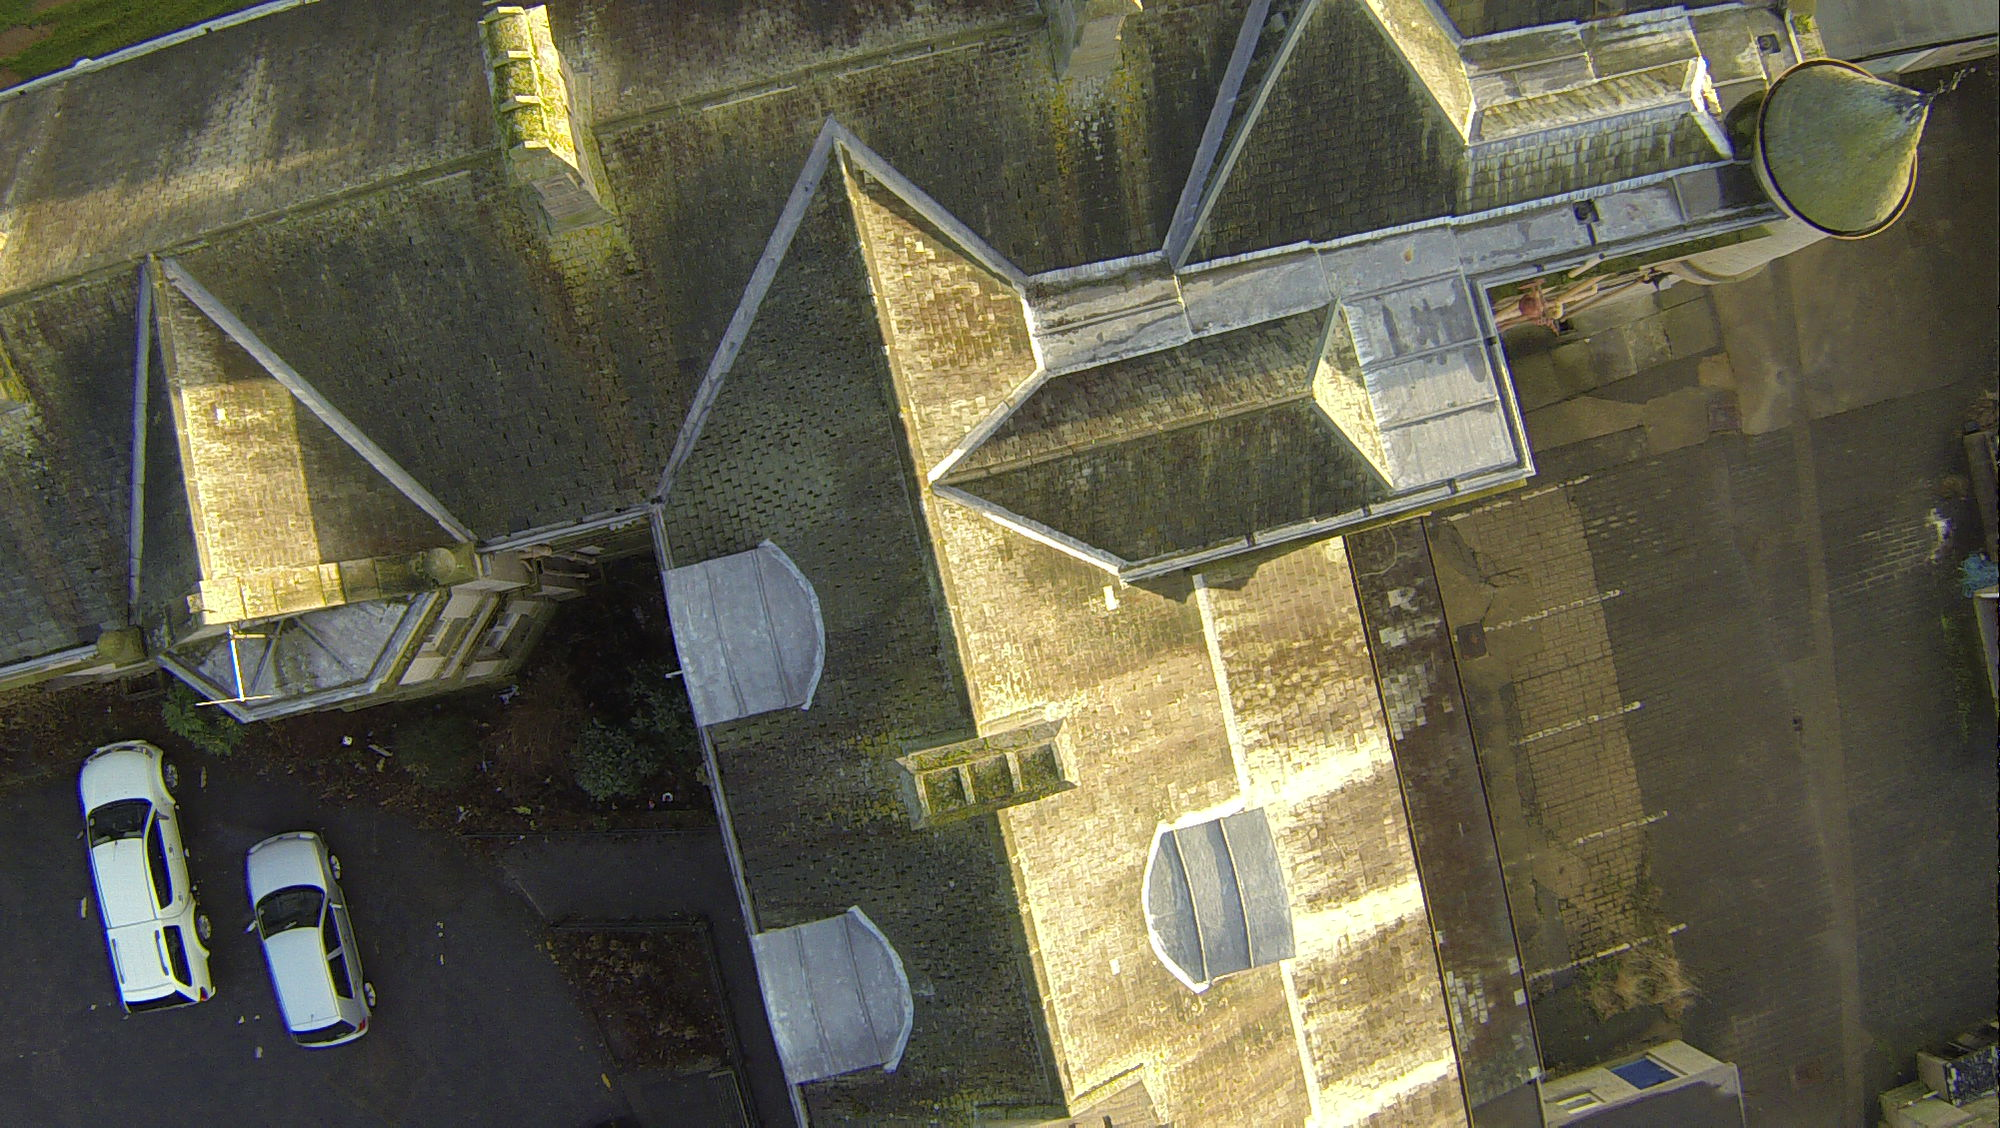 Roof inspection - Survey Drones